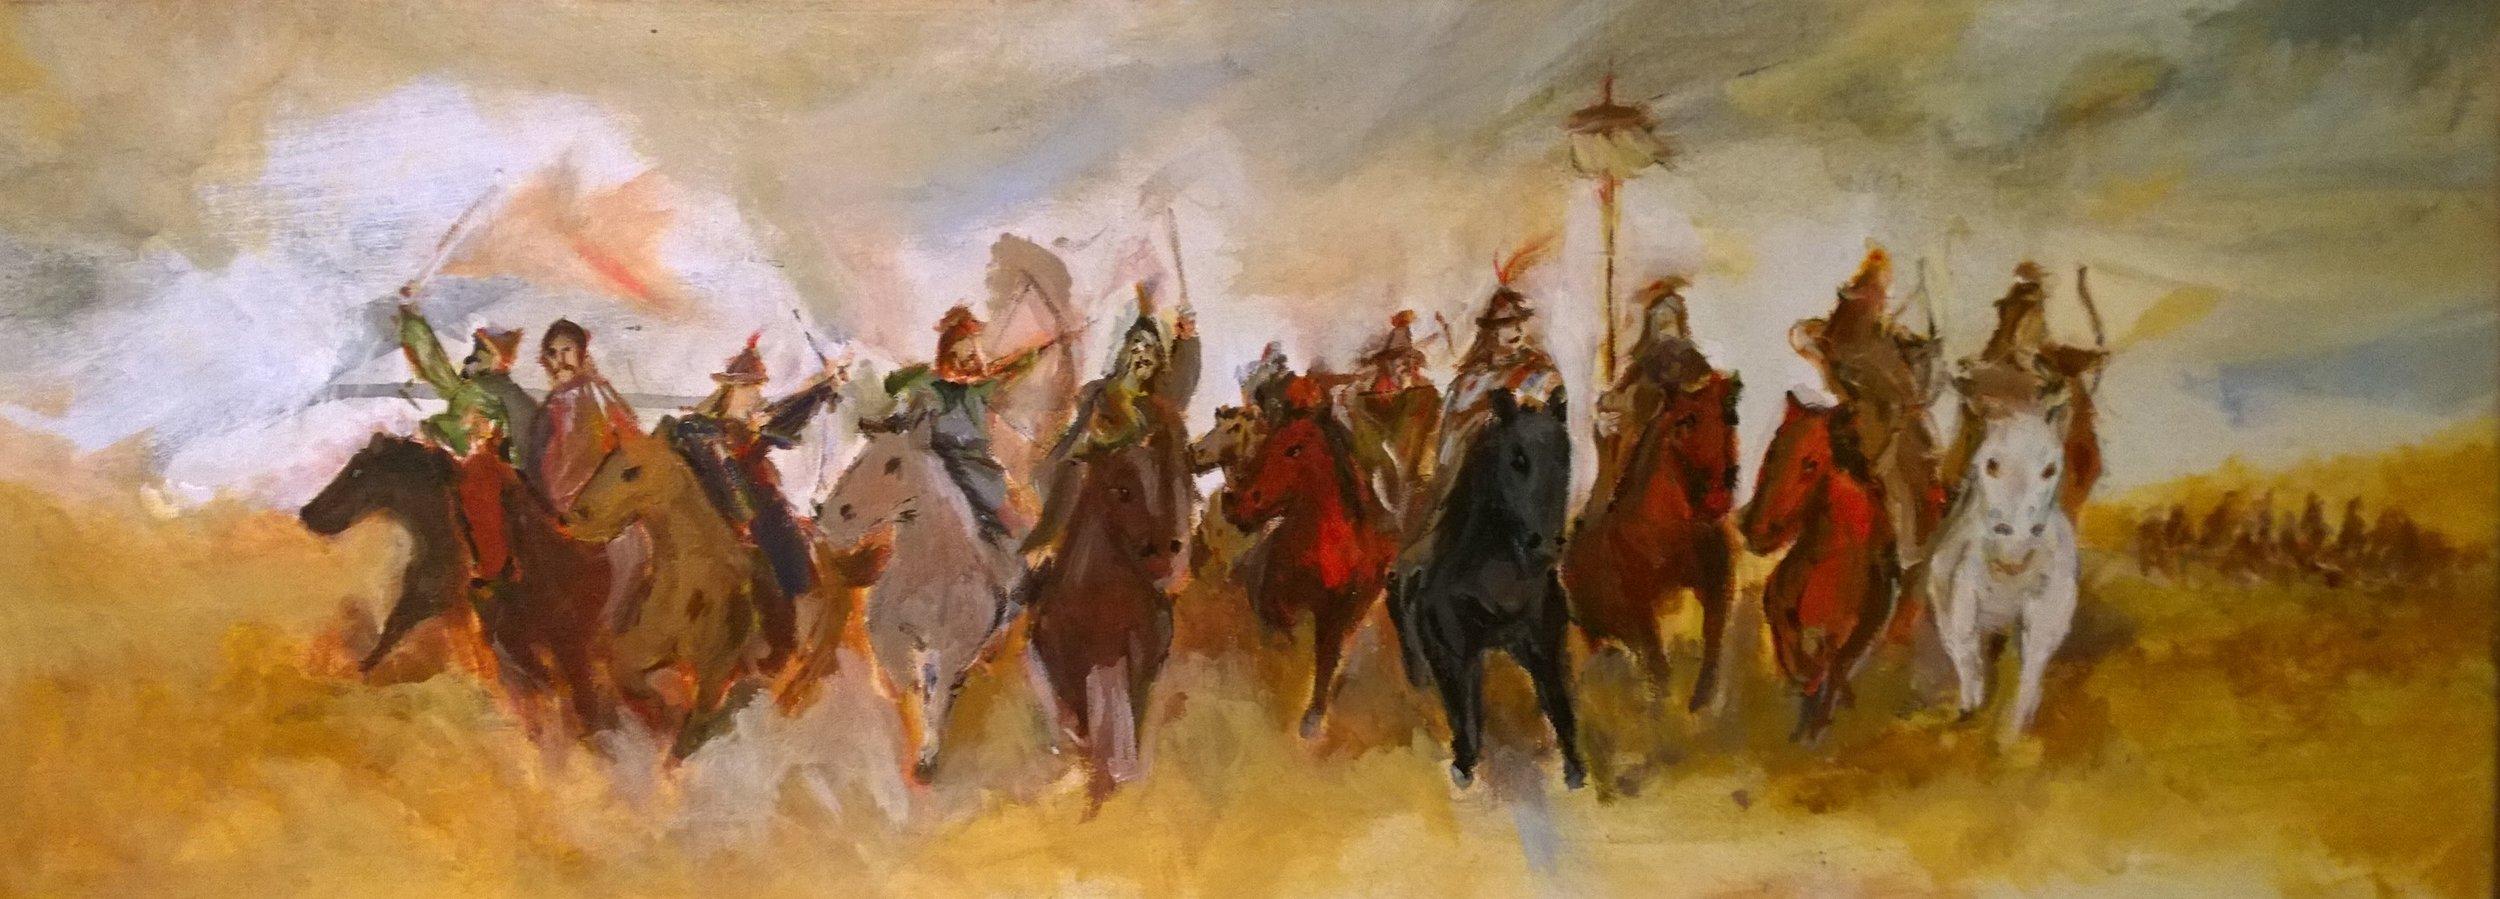 Rider of the North